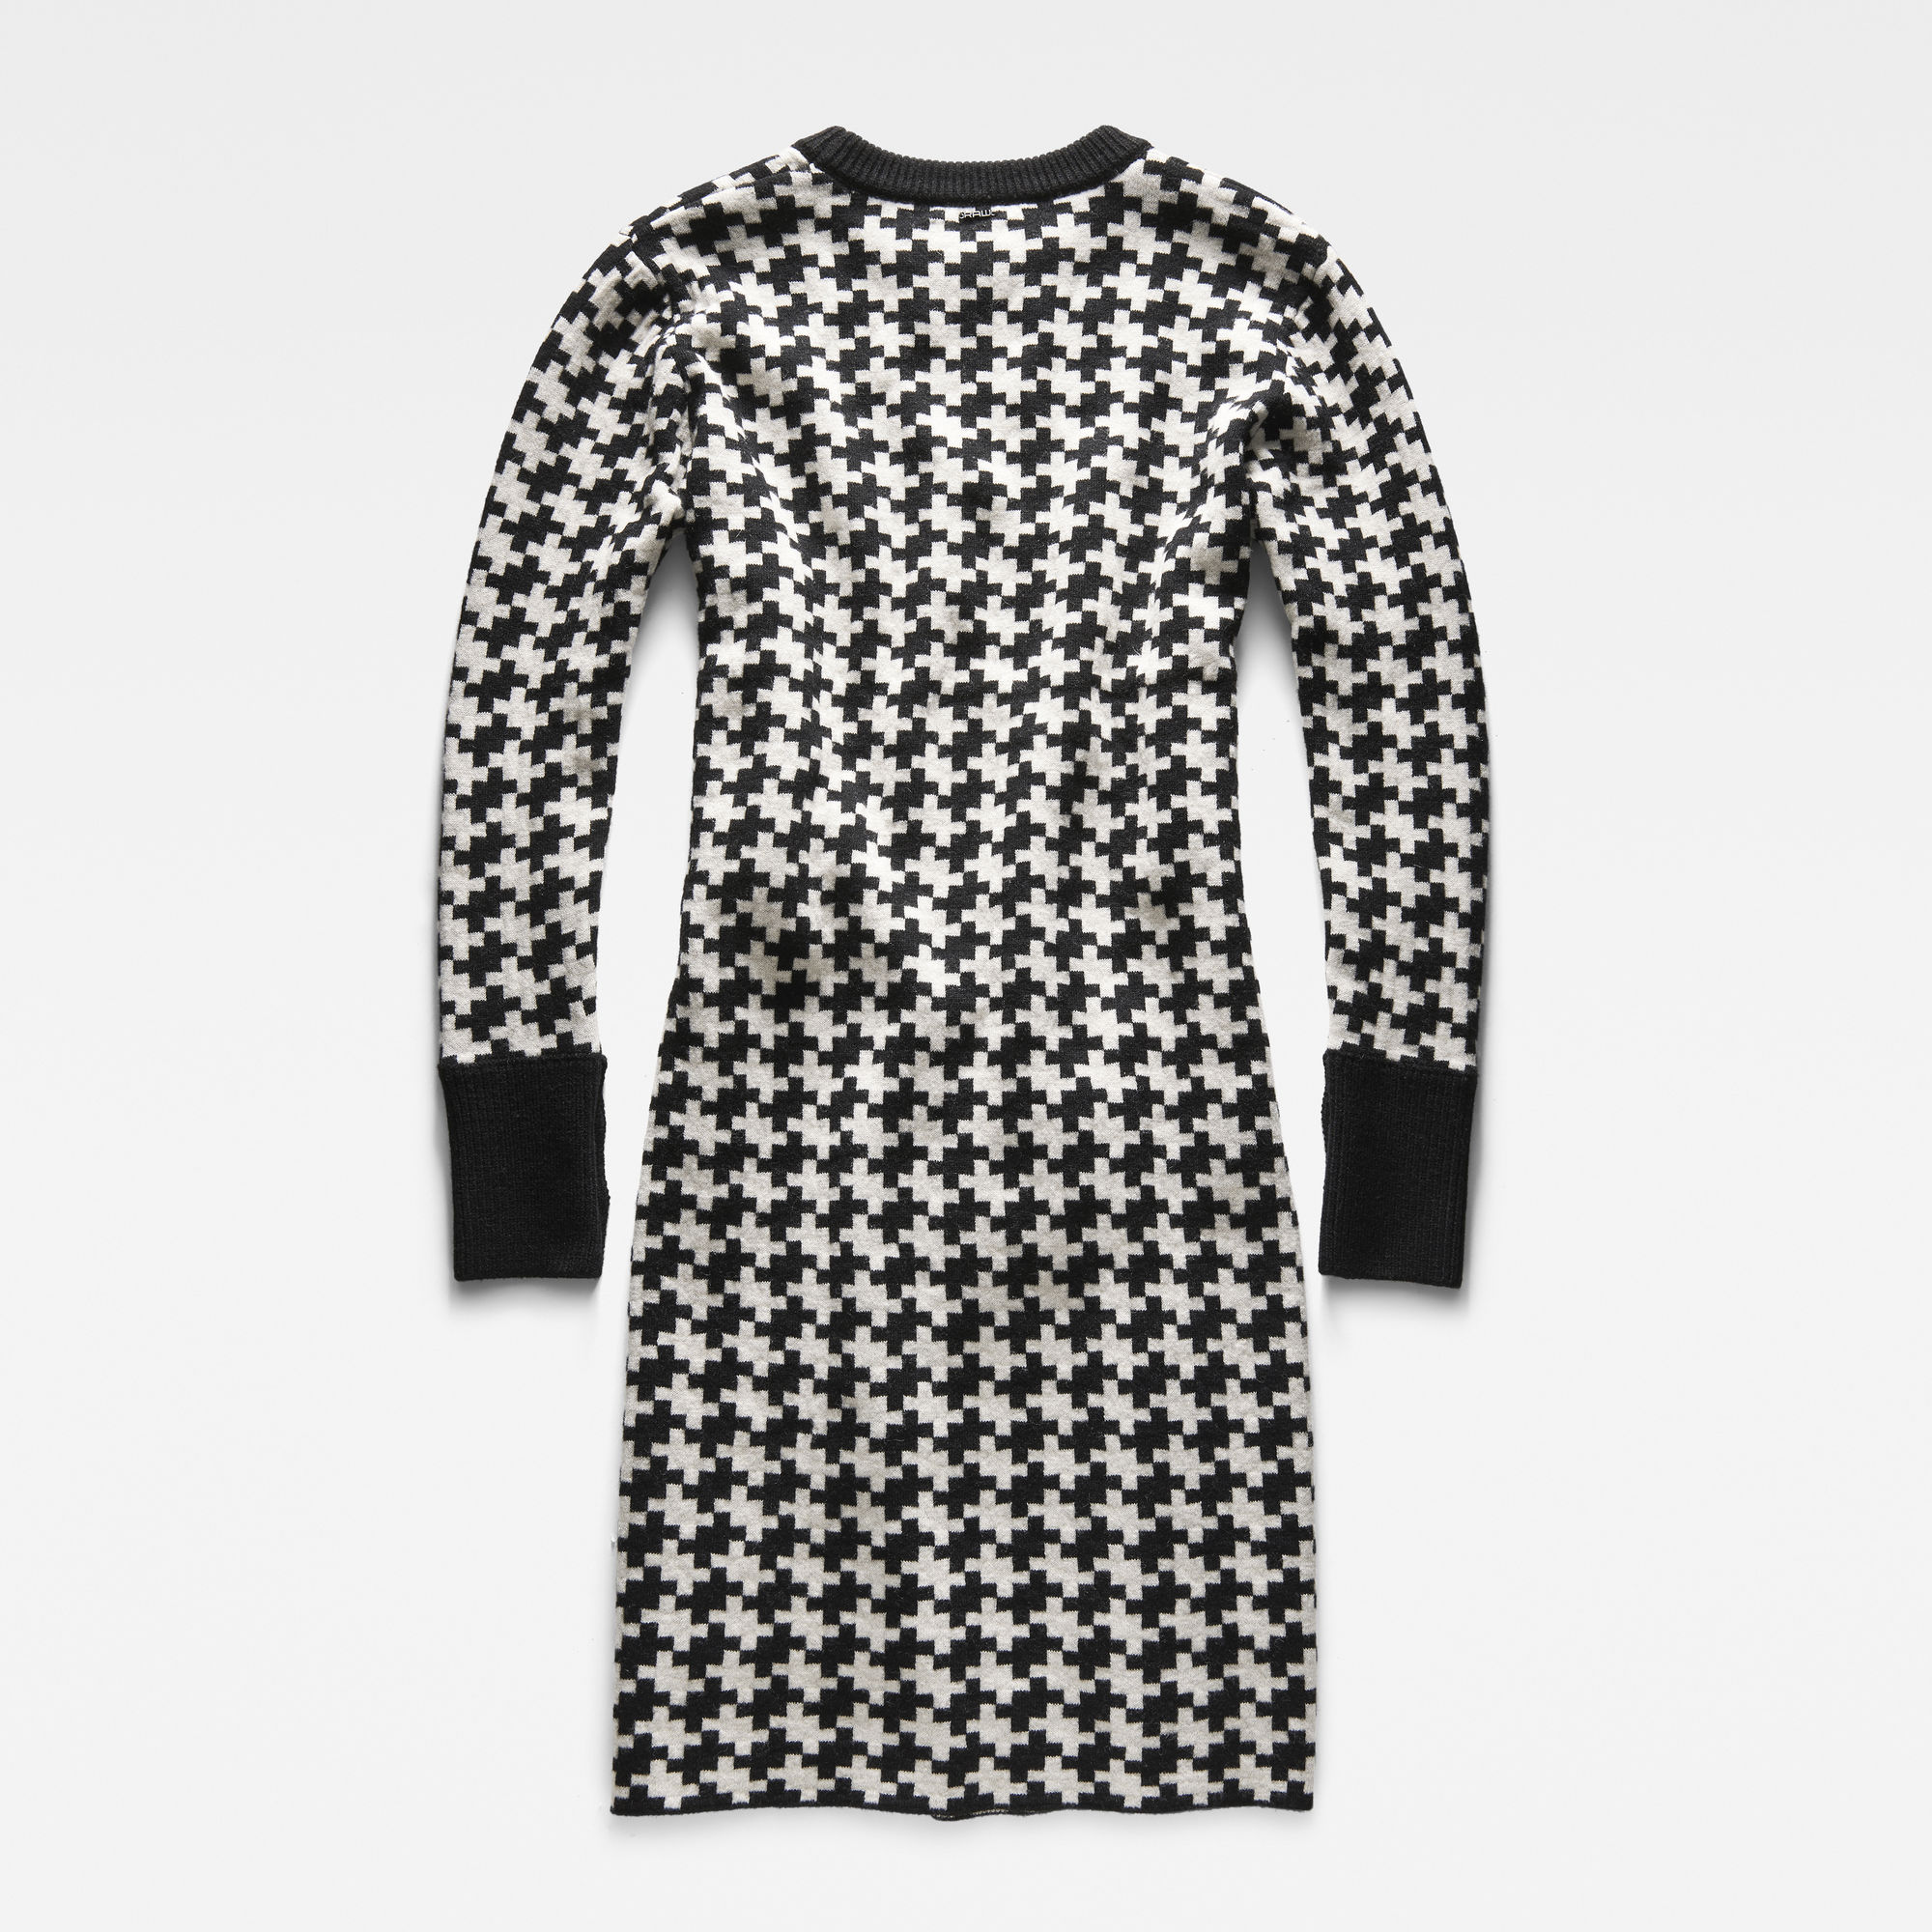 Evalak Jacquard Knit Dress